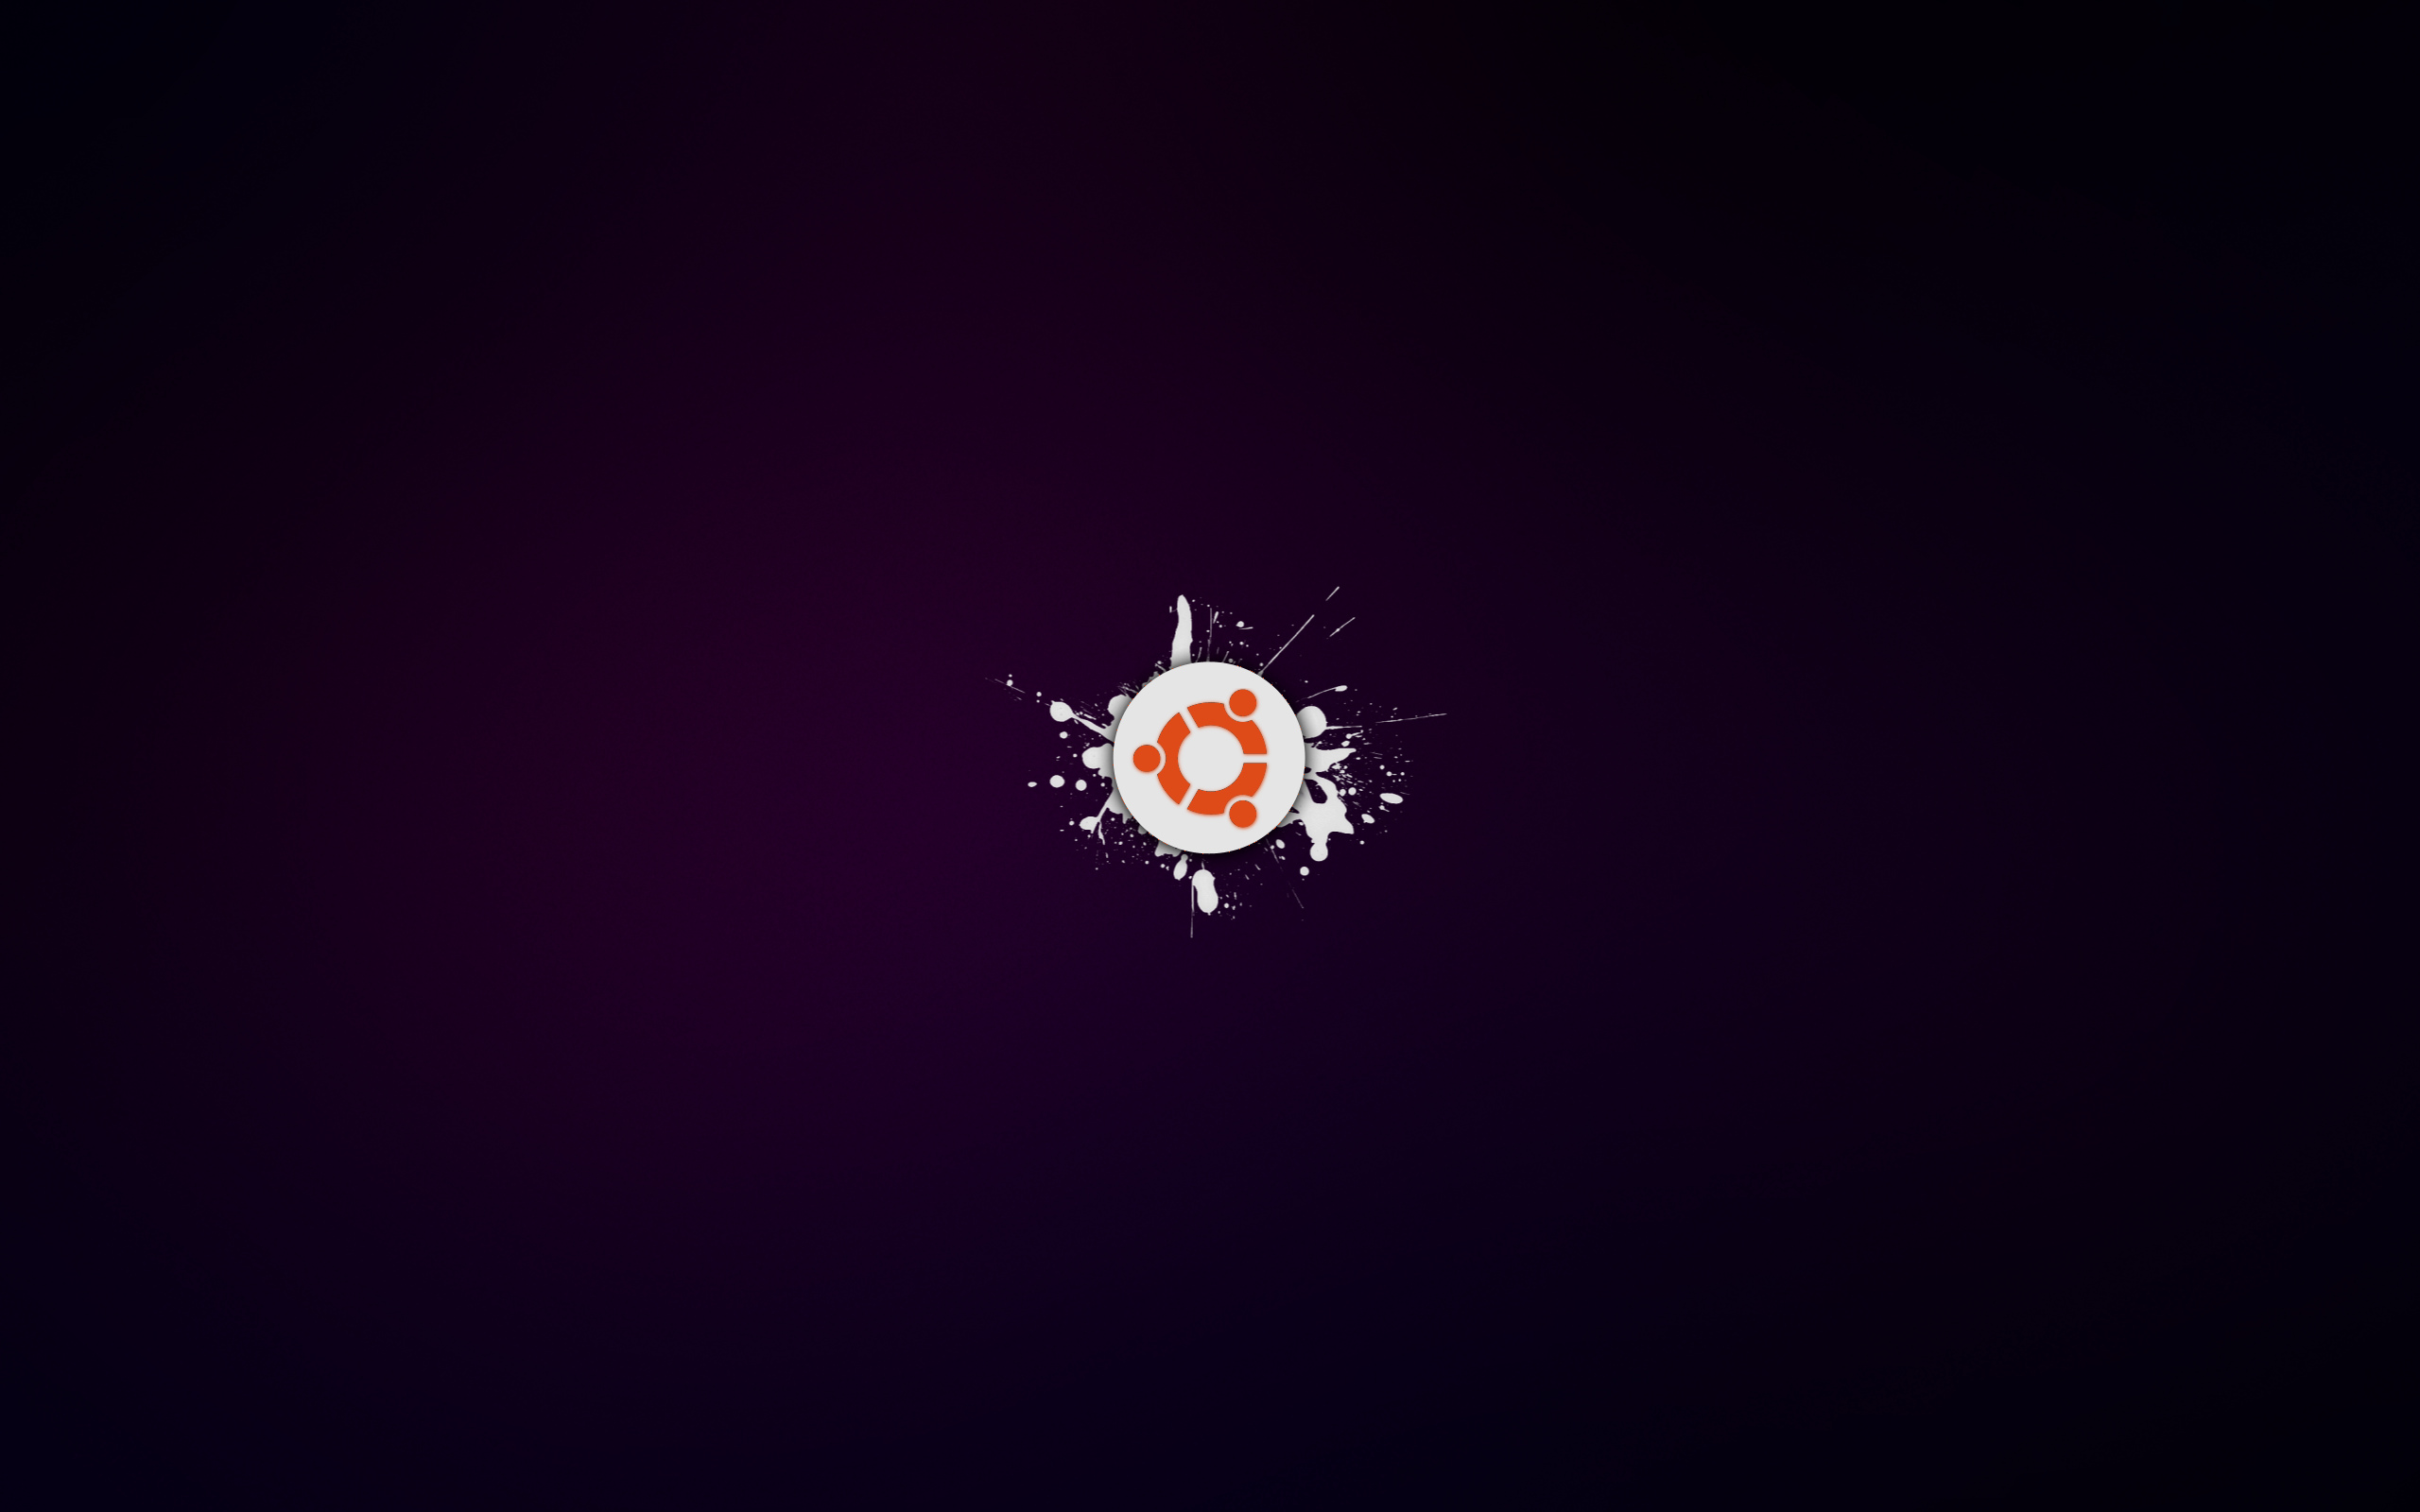 Ubuntu Hd wallpaper 251364 2560x1600